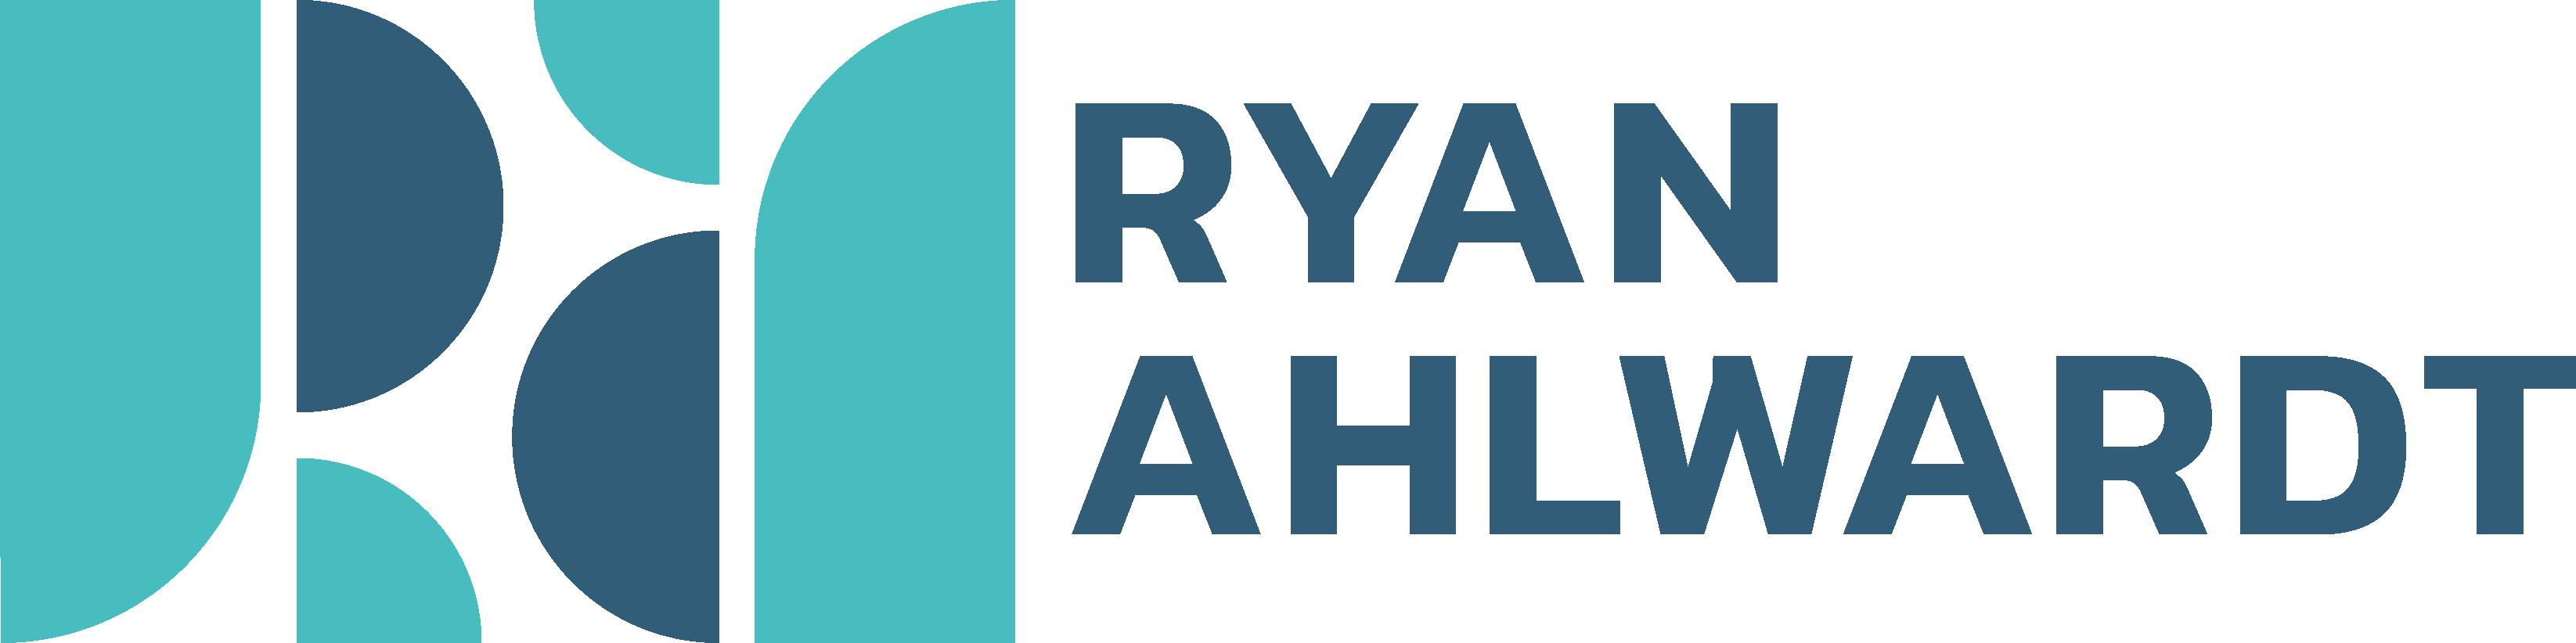 Ryan Ahlwardt_Alt Logo 1_Color